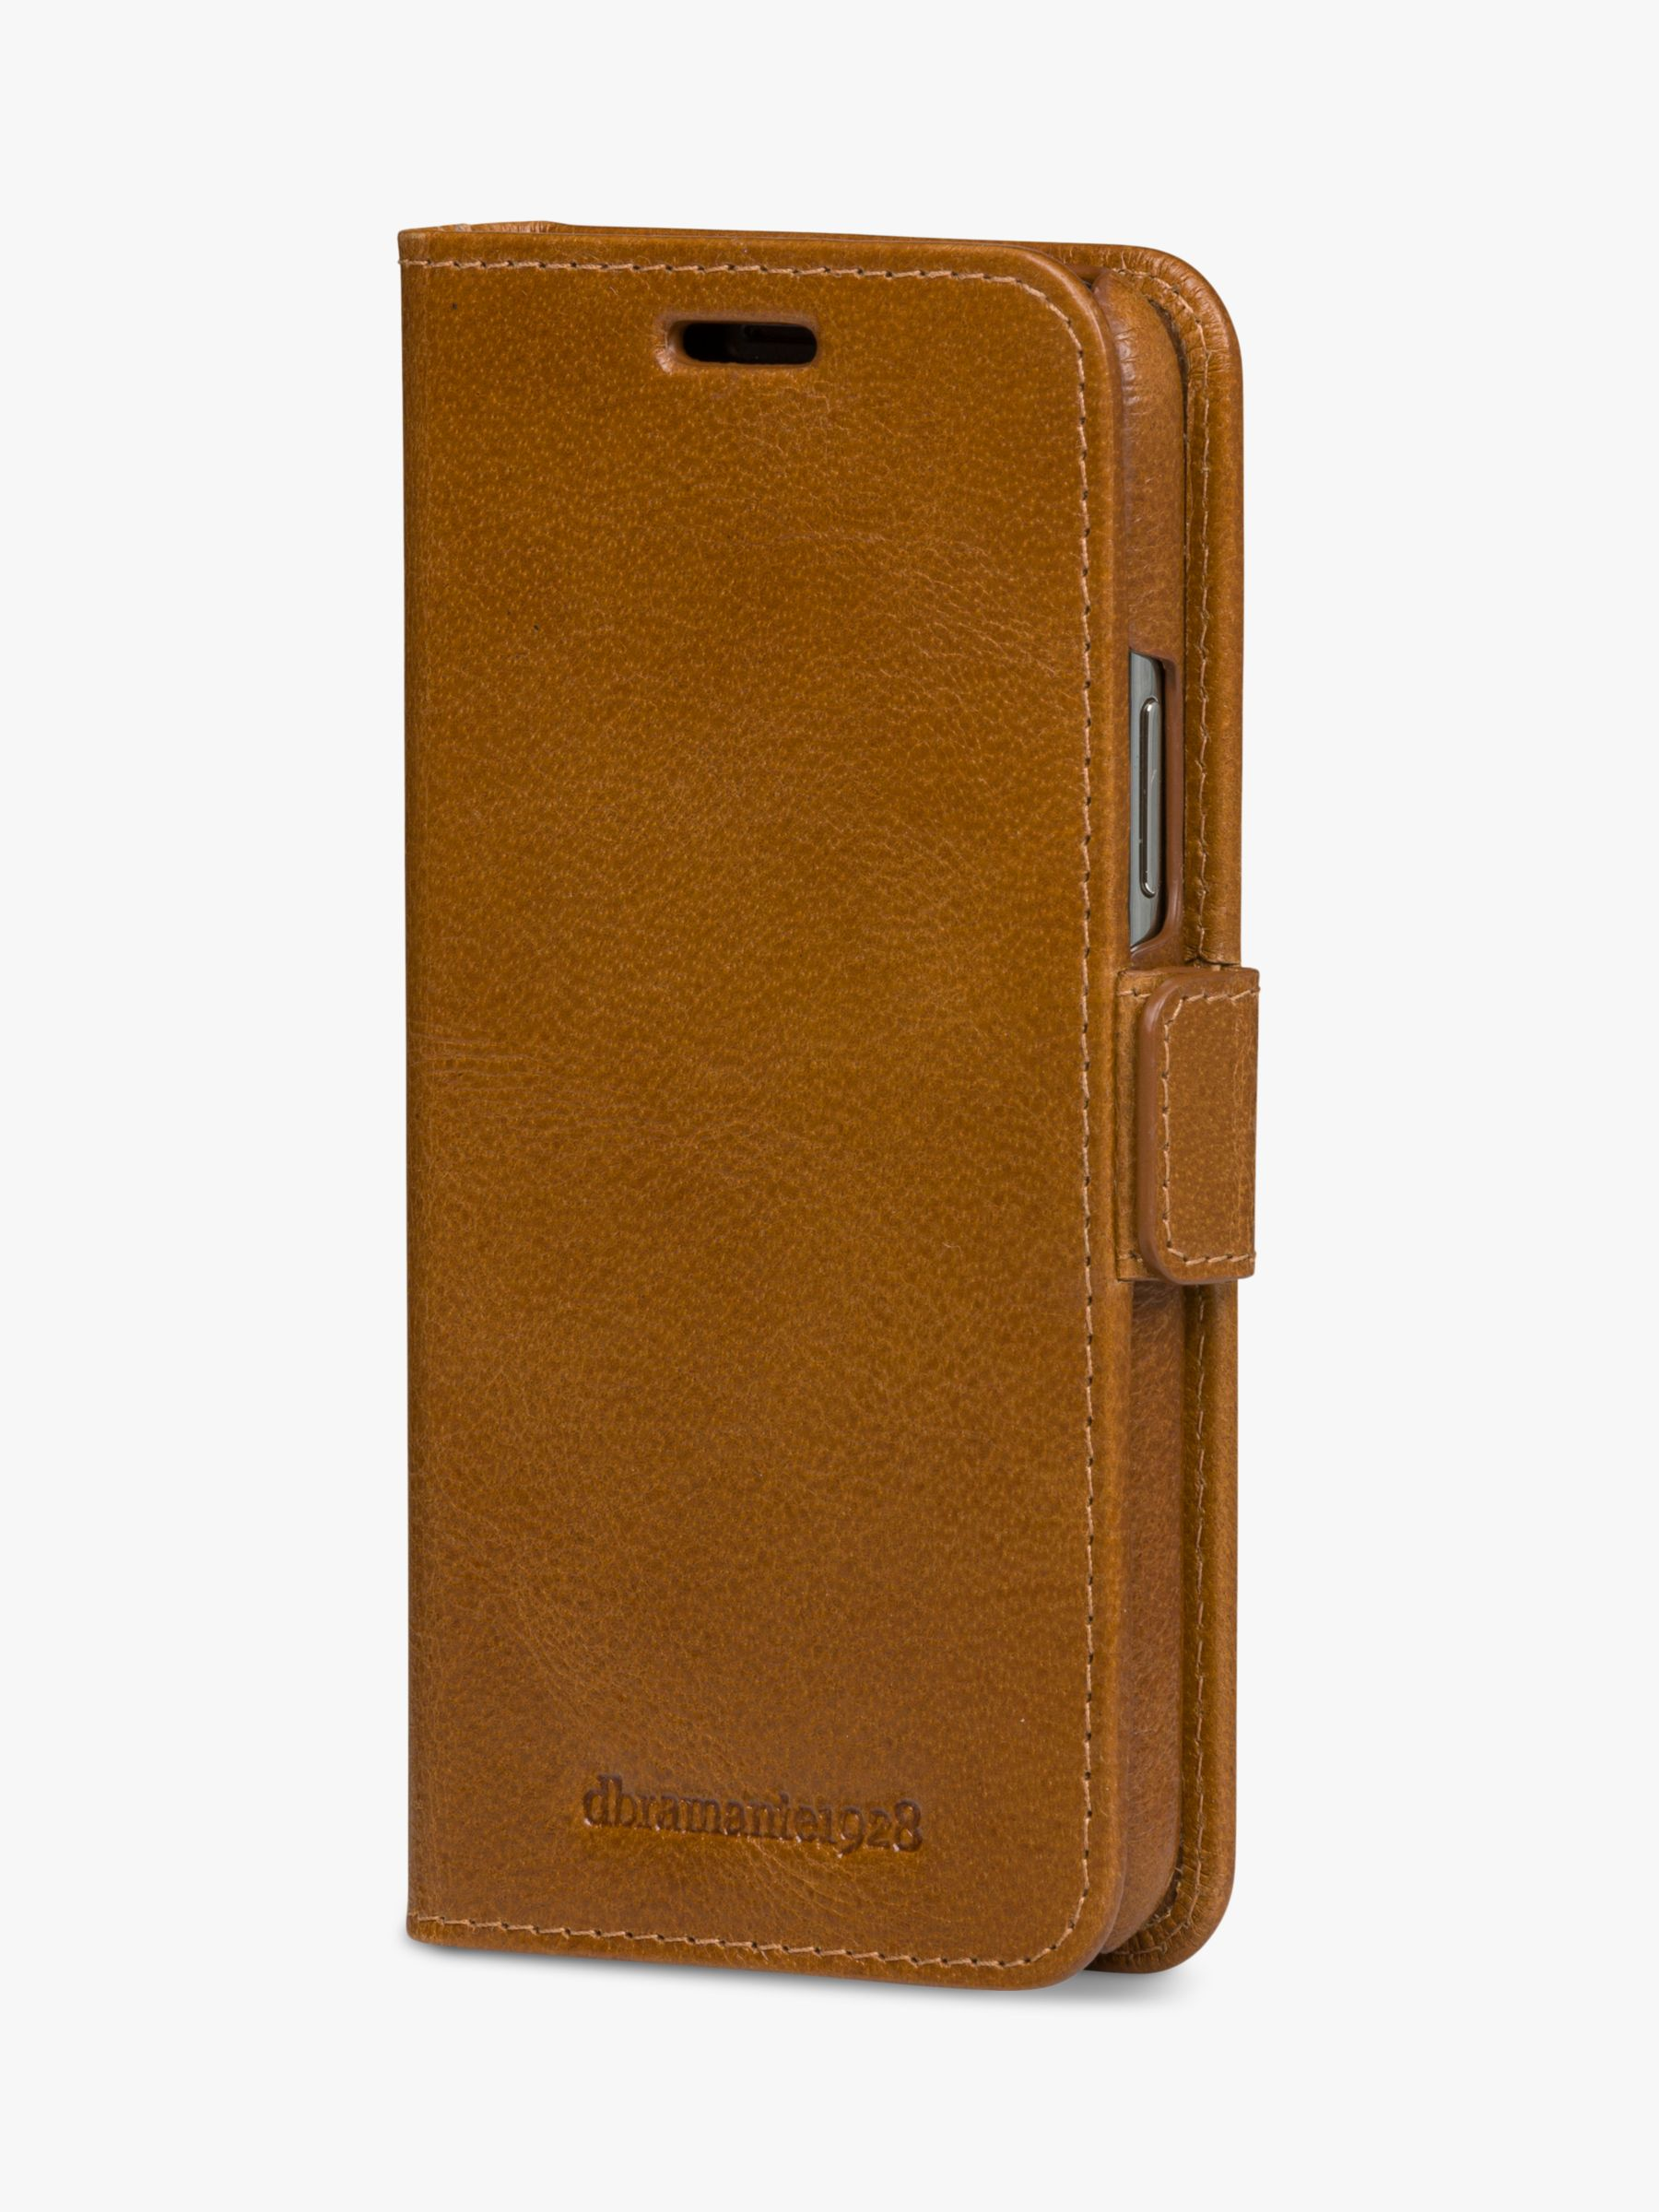 dbramante1928 MODE New York dbramante1928 Folio/Cradle Case for iPhone 11 Pro Max, Tan